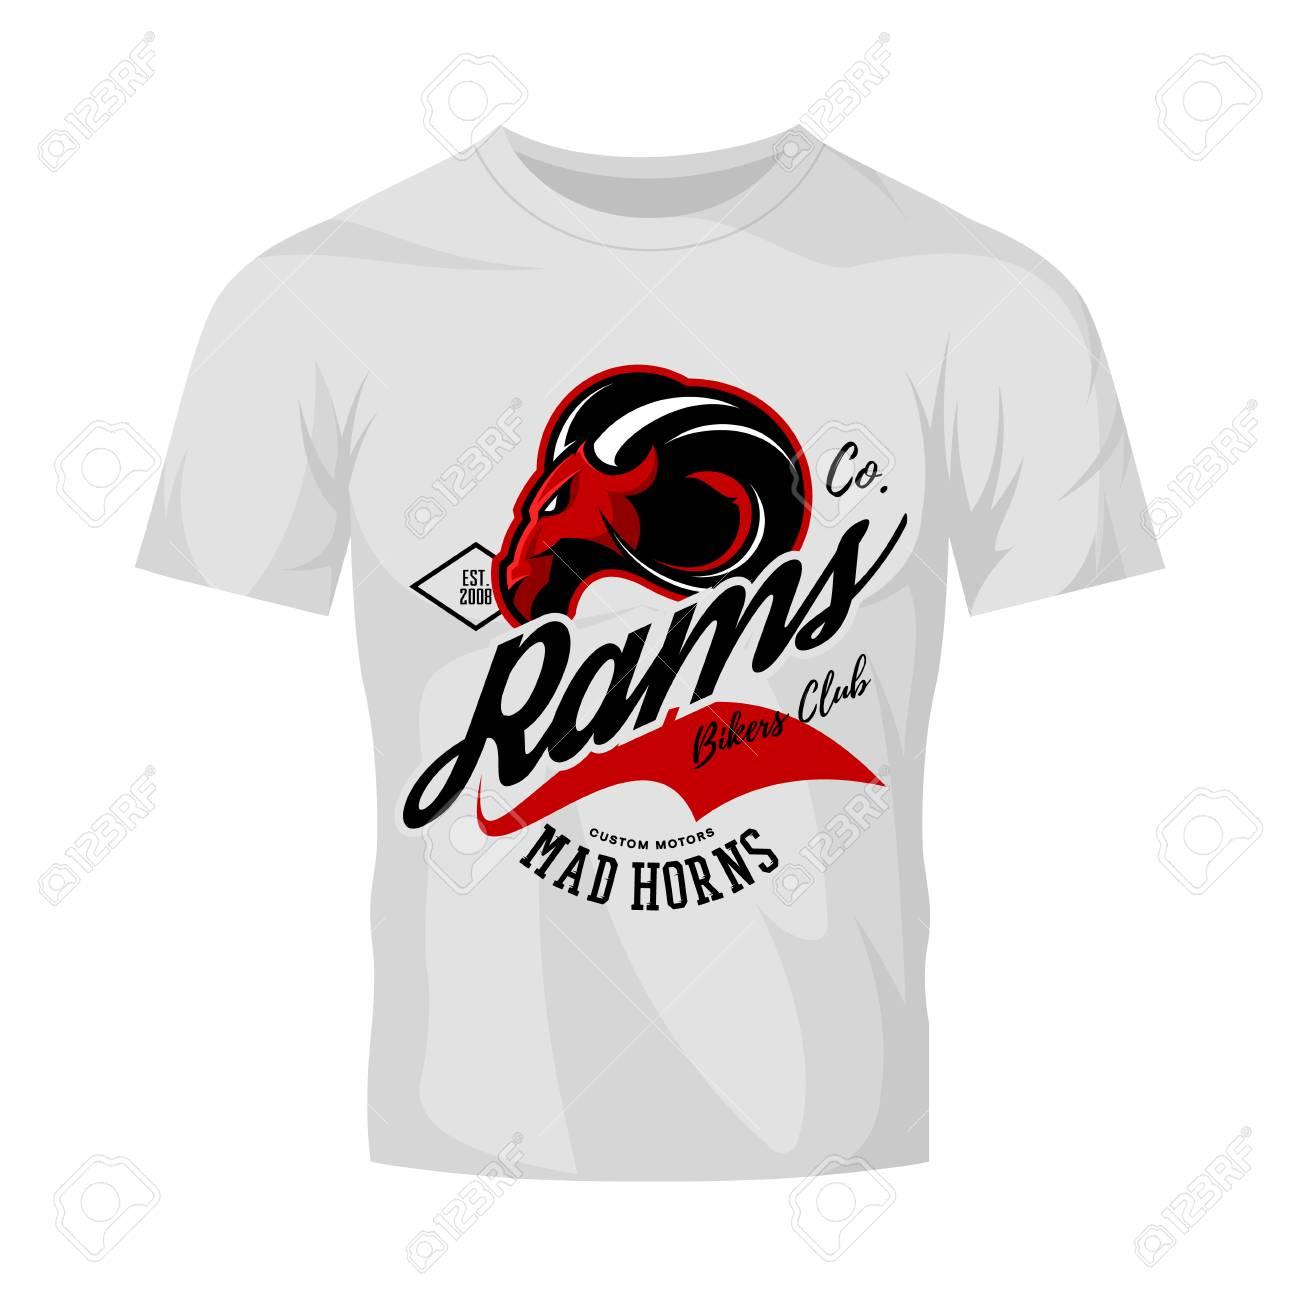 Vintage American furious ram bikers club tee print vector design isolated on white t-shirt mockup. Street wear t-shirt emblem. Mascot logo concept illustration. - 77756778